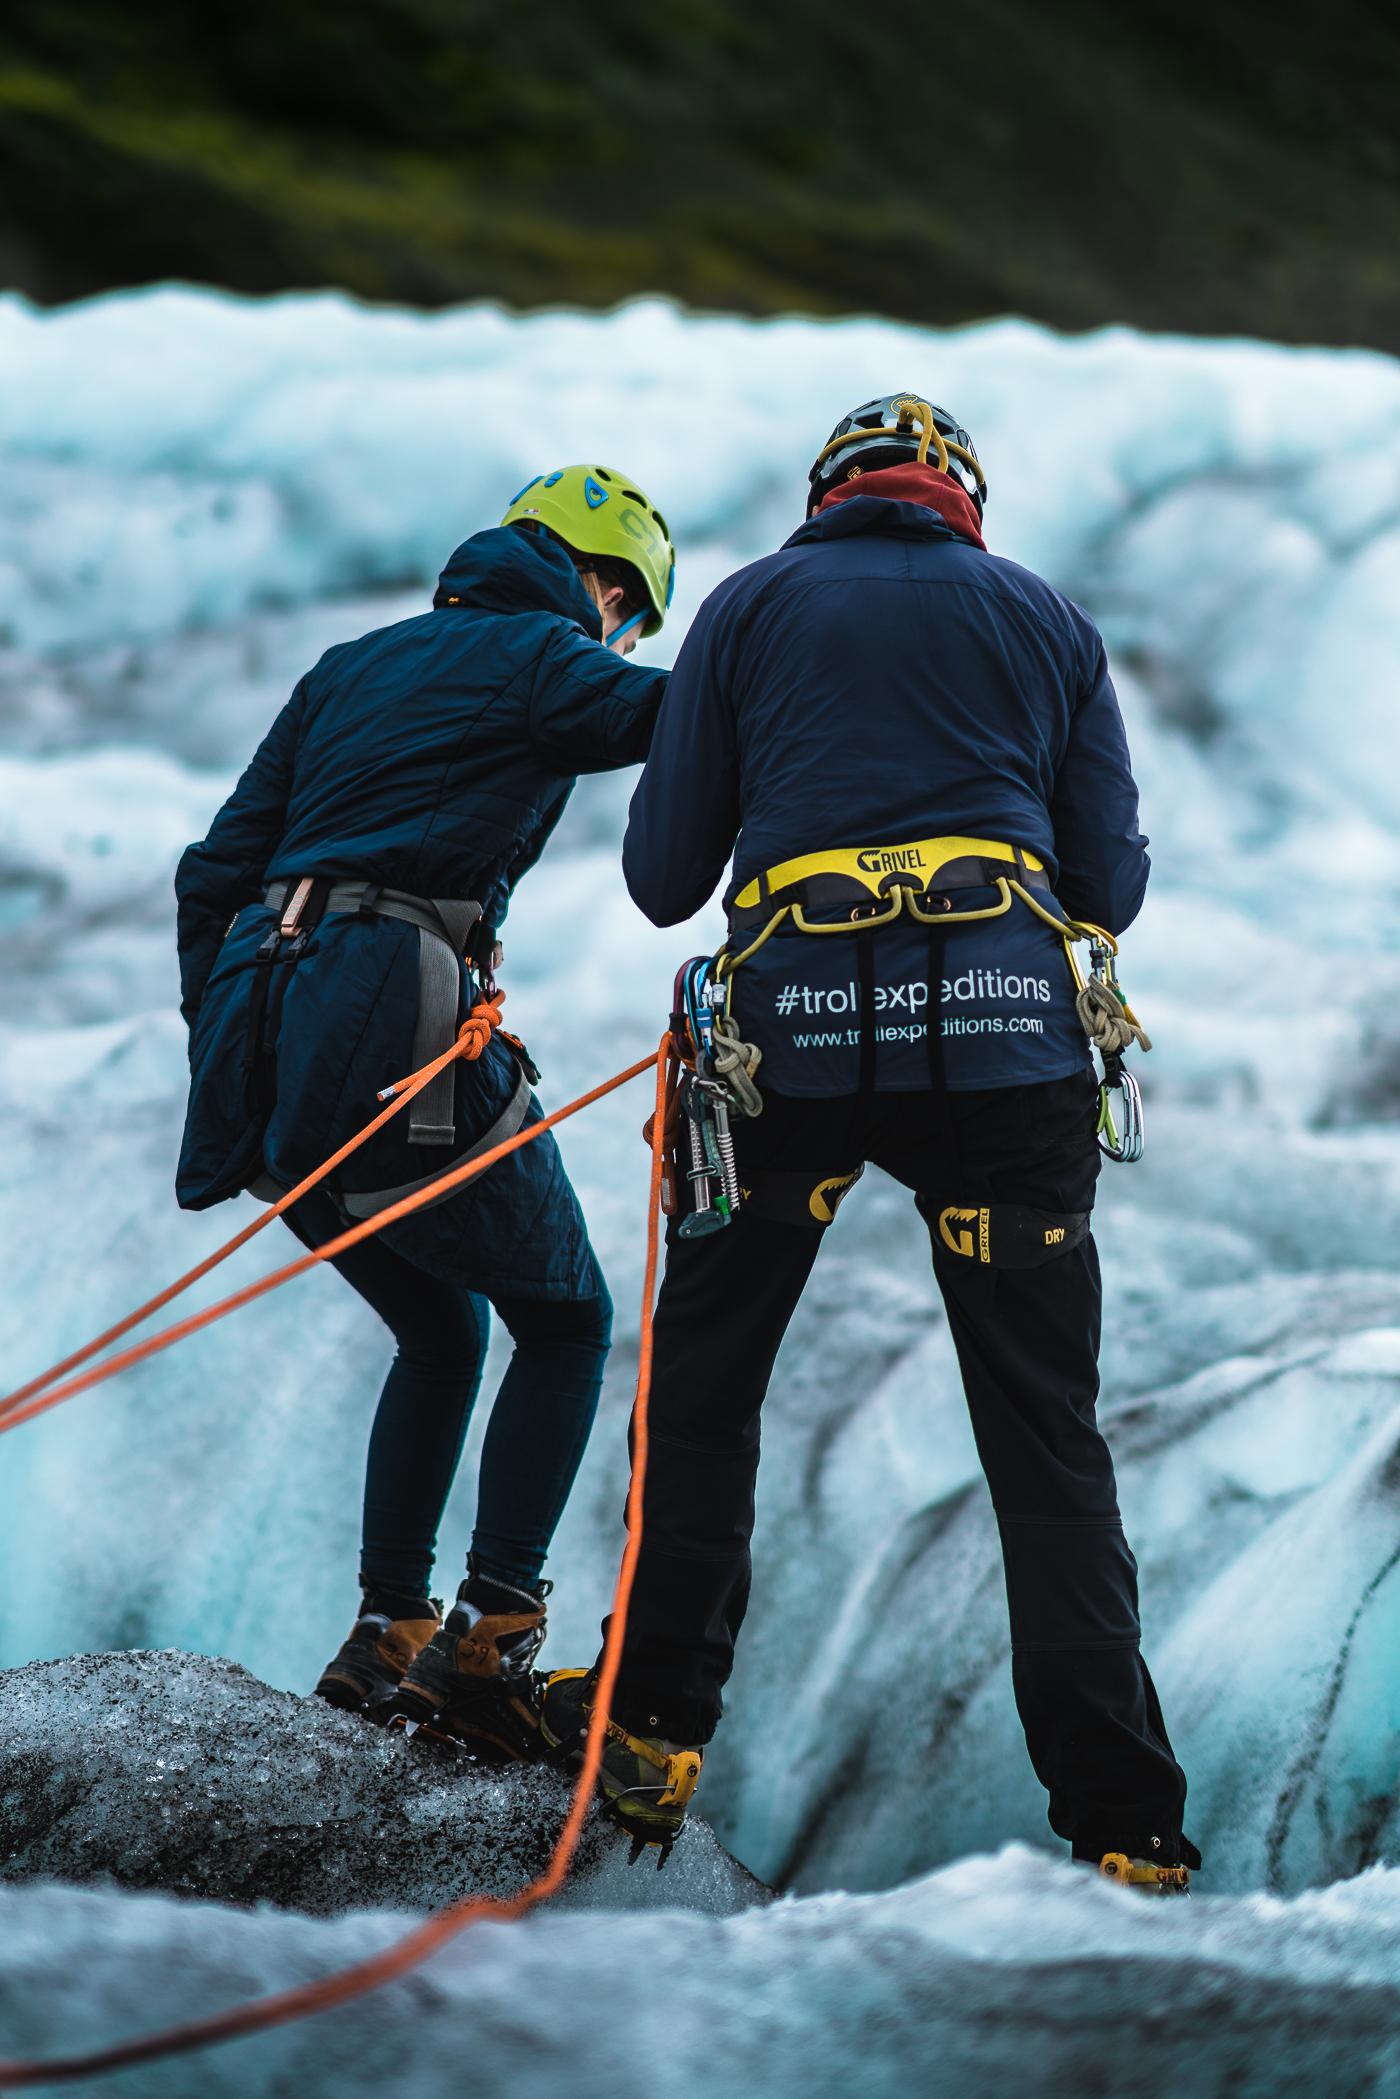 gabornagy_photography_iceland_glacier17.jpg